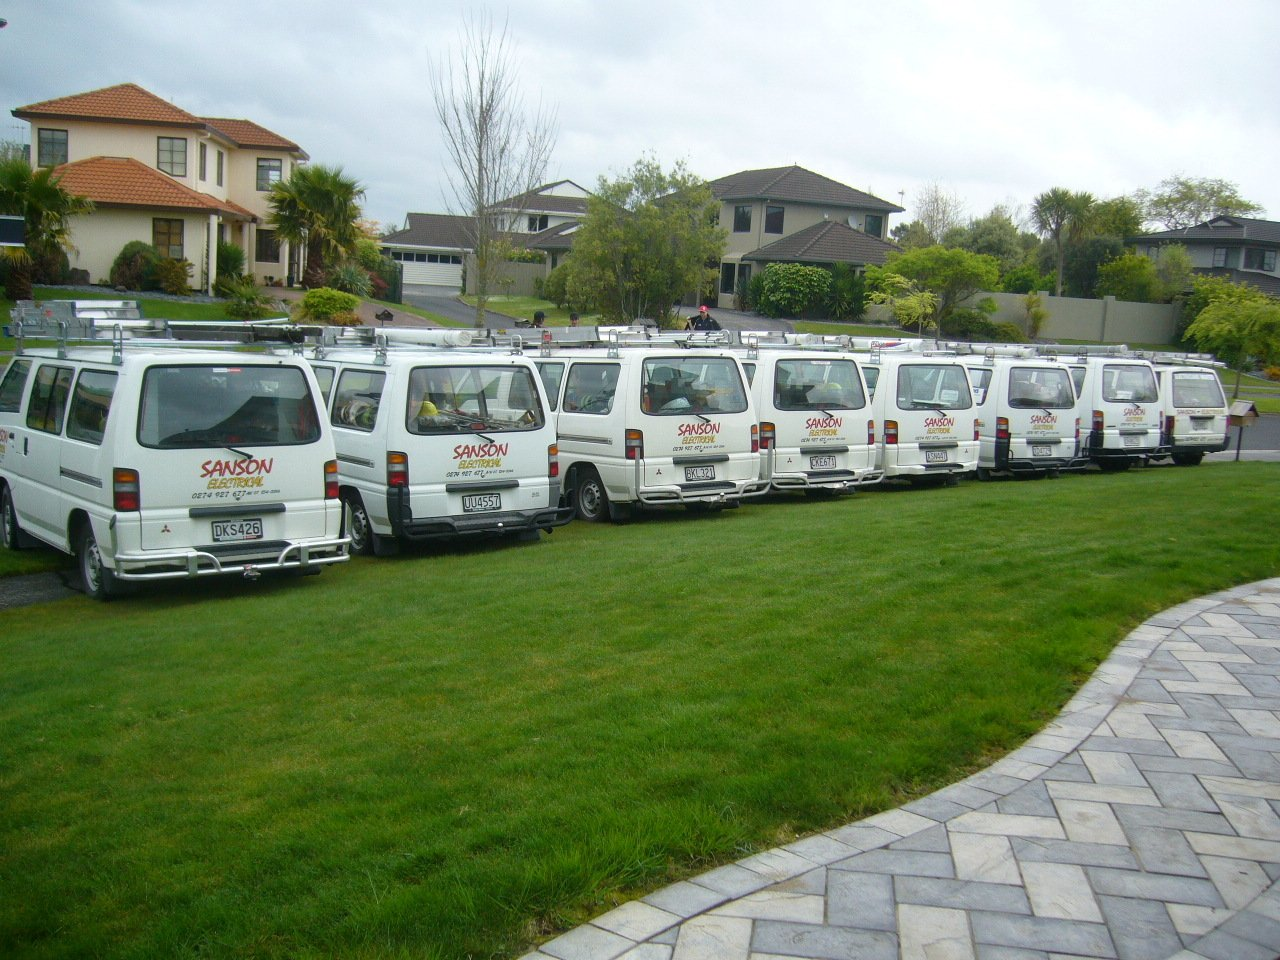 Sanson electrical van parked together